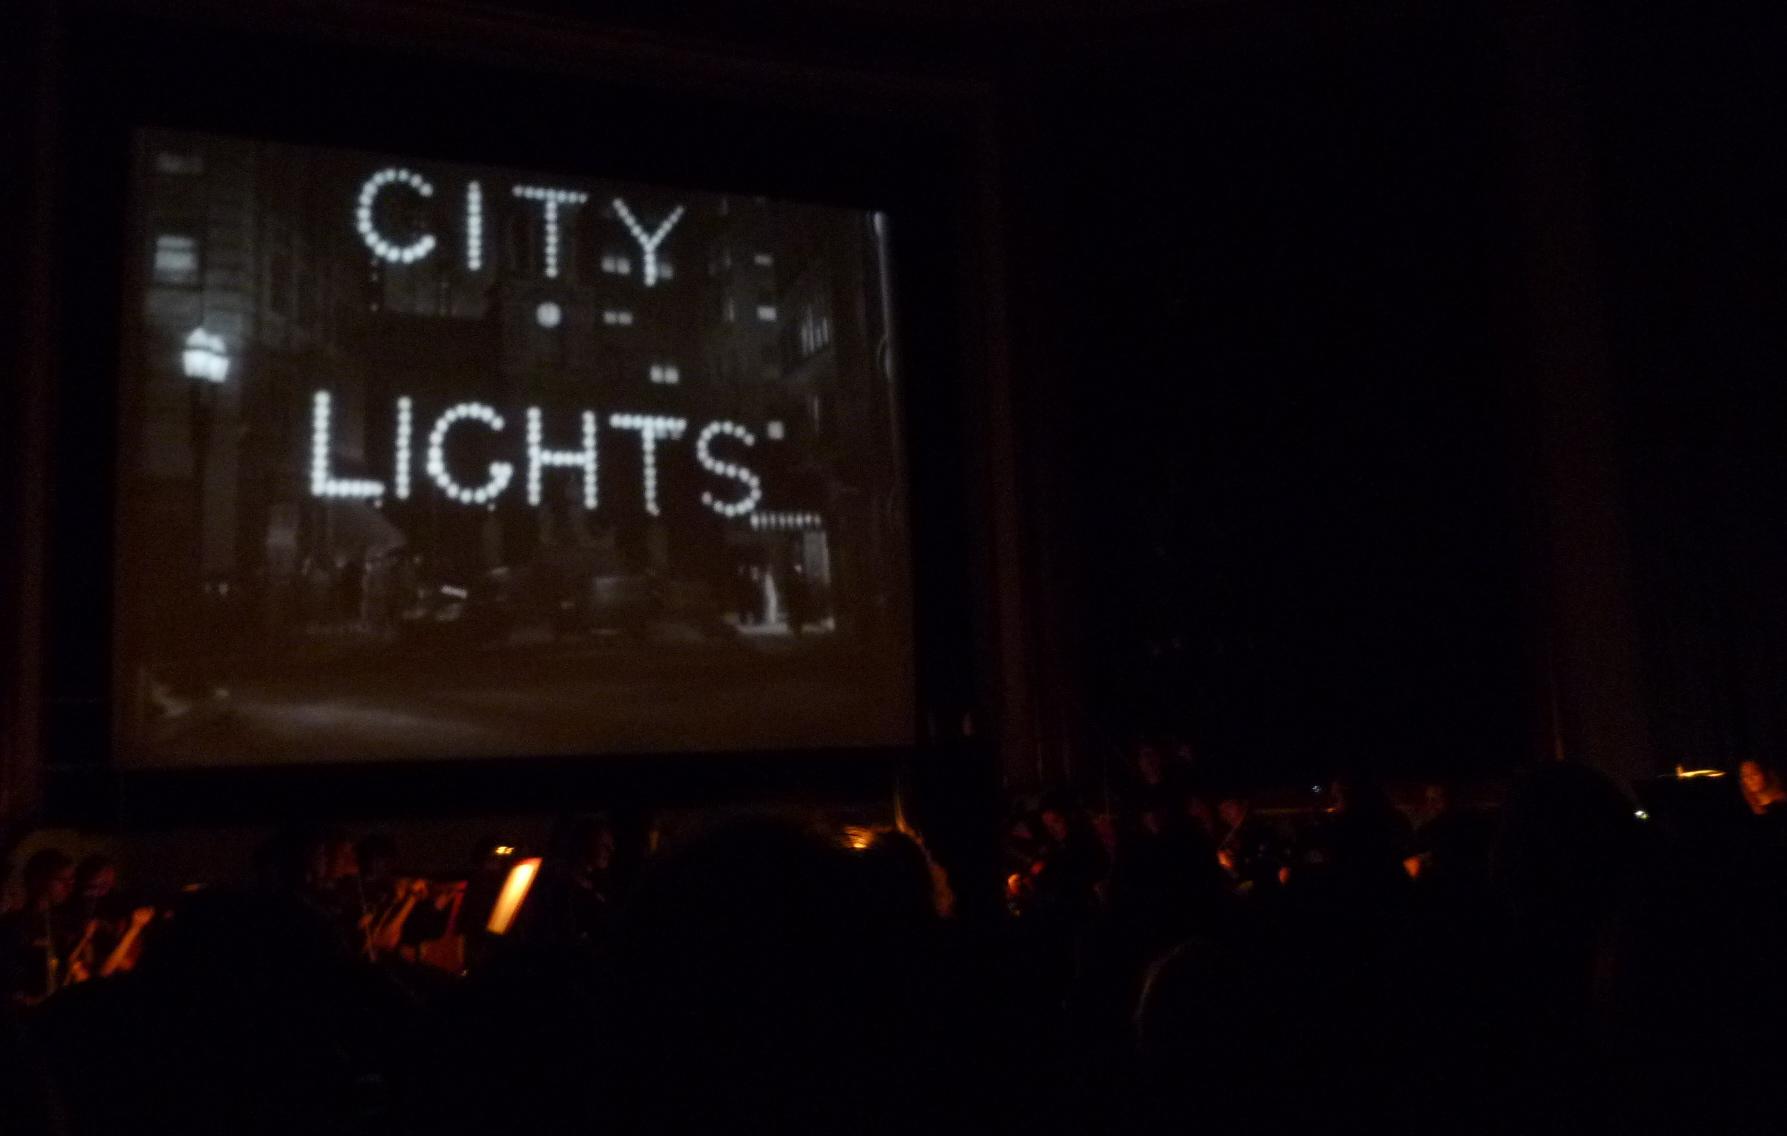 City Lights_c0180686_1514795.jpg